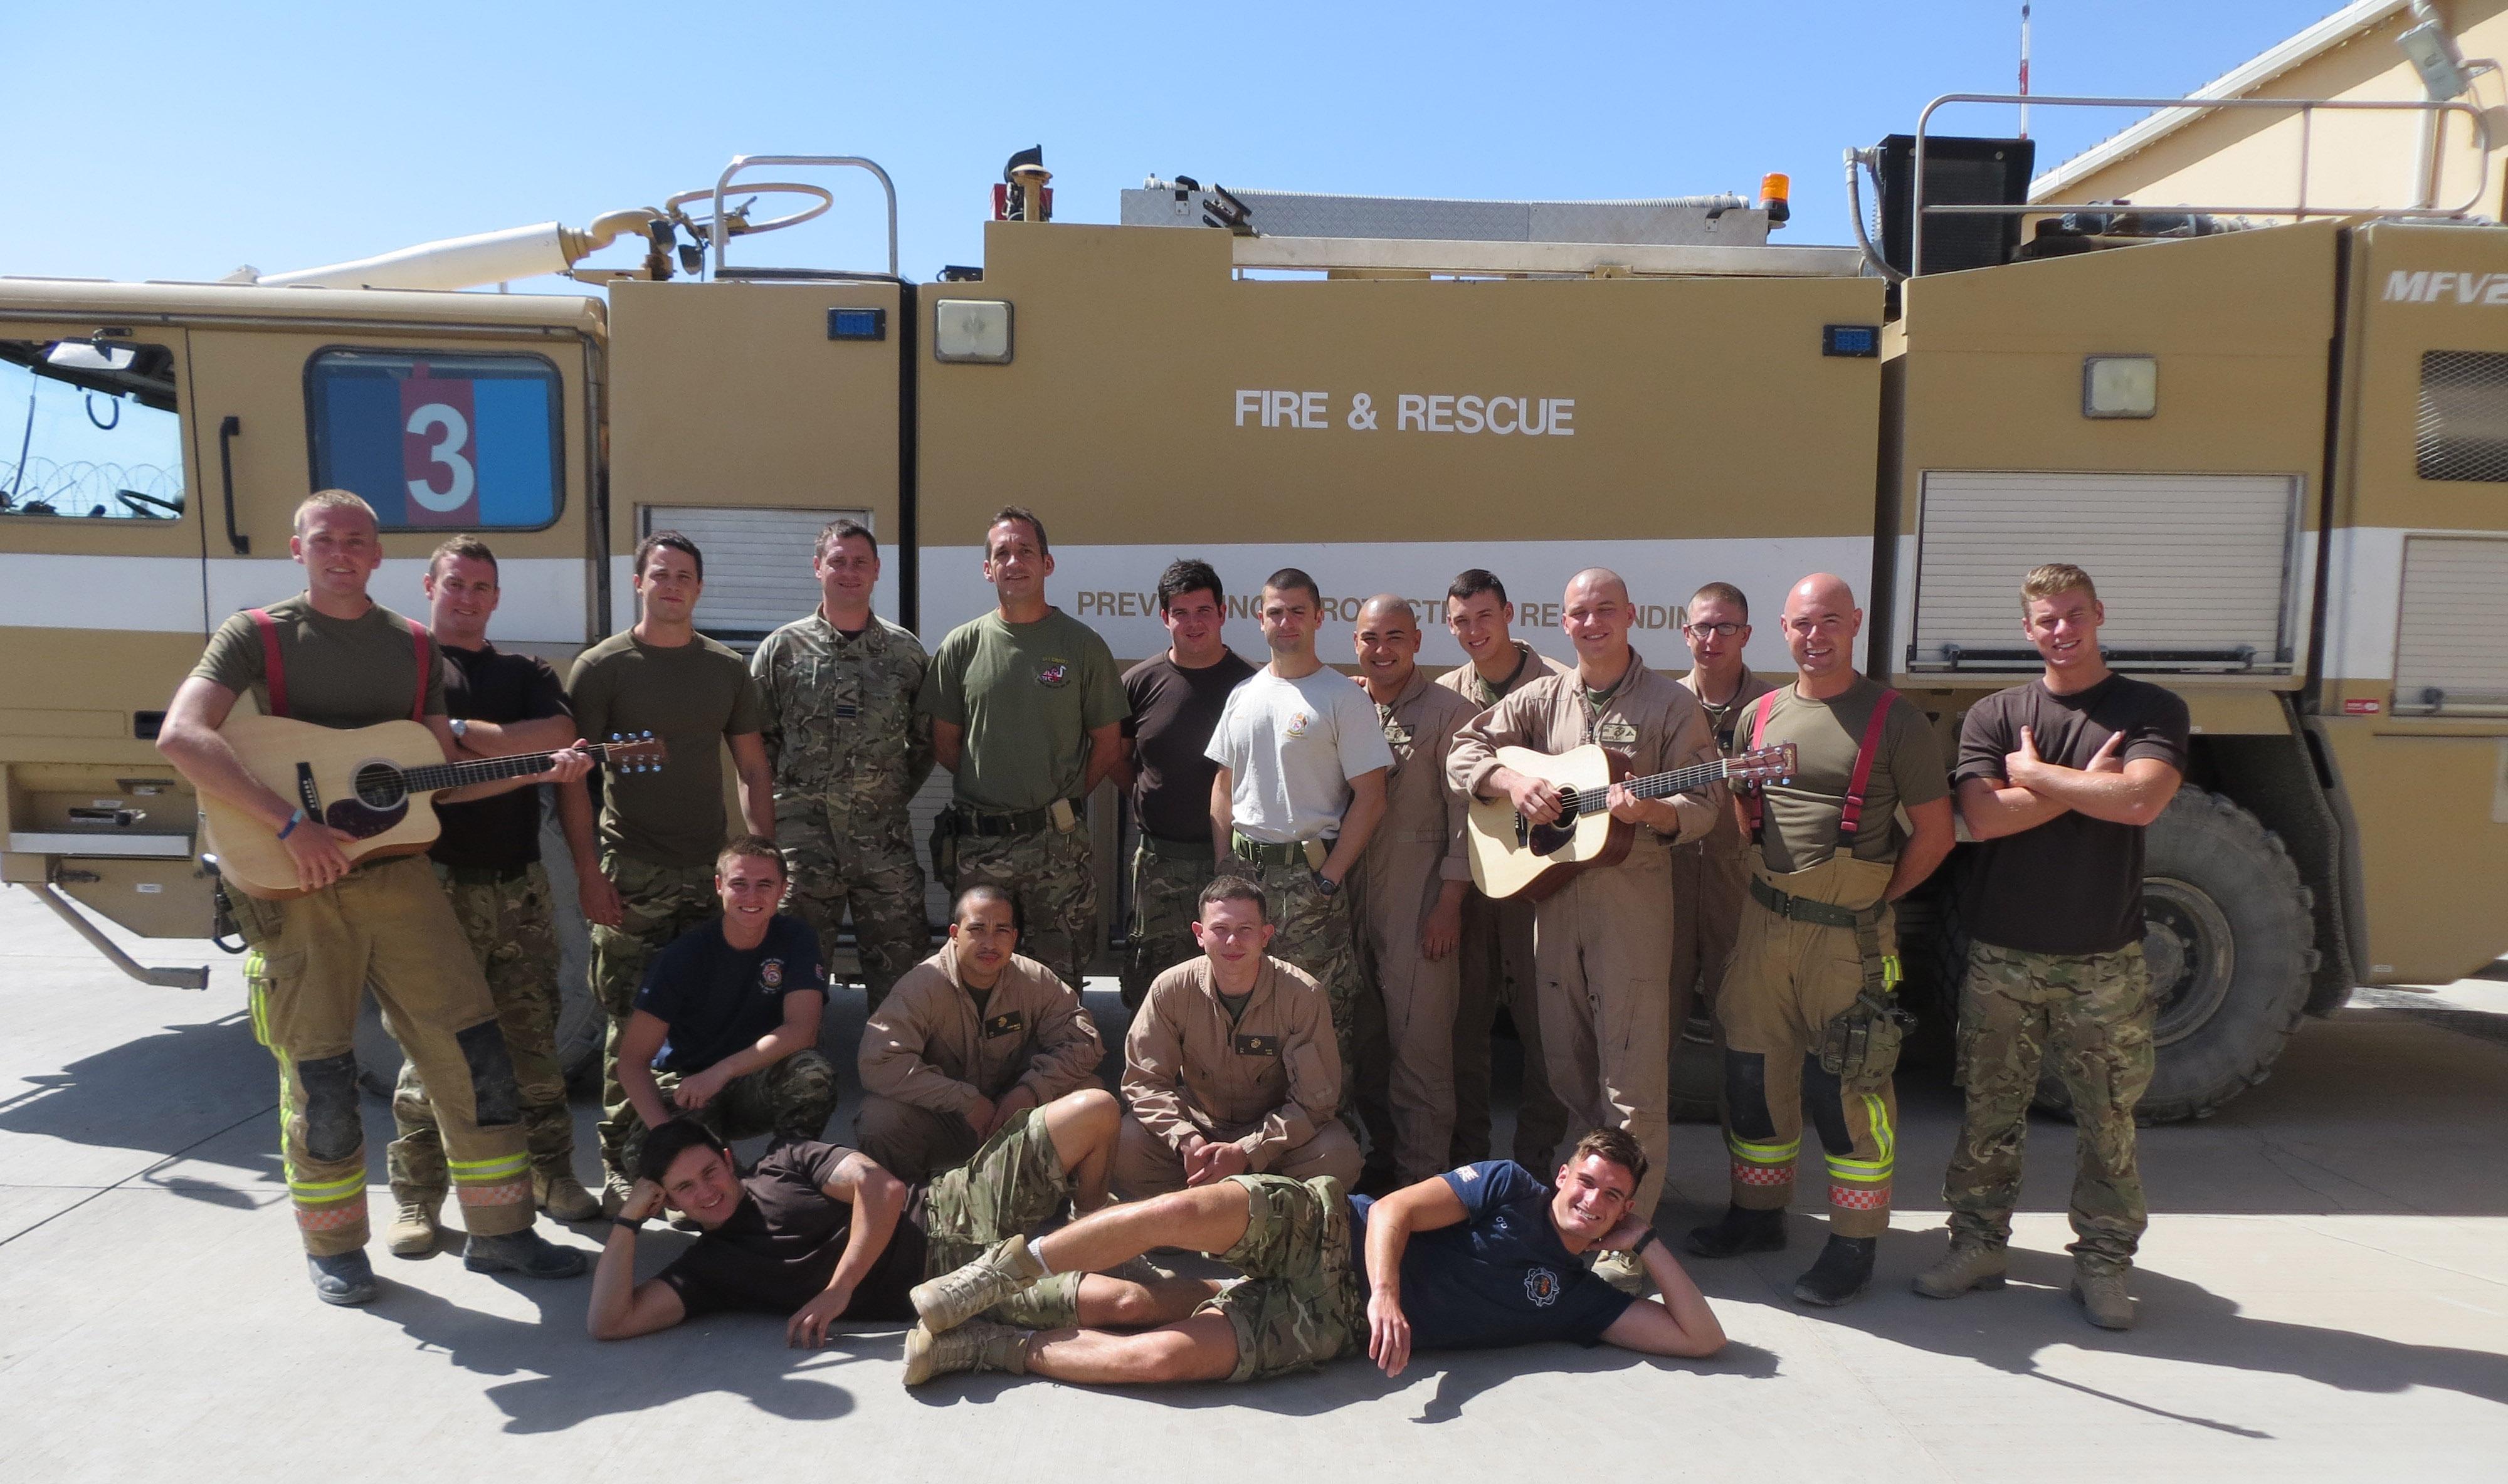 RAF Crew with guitars